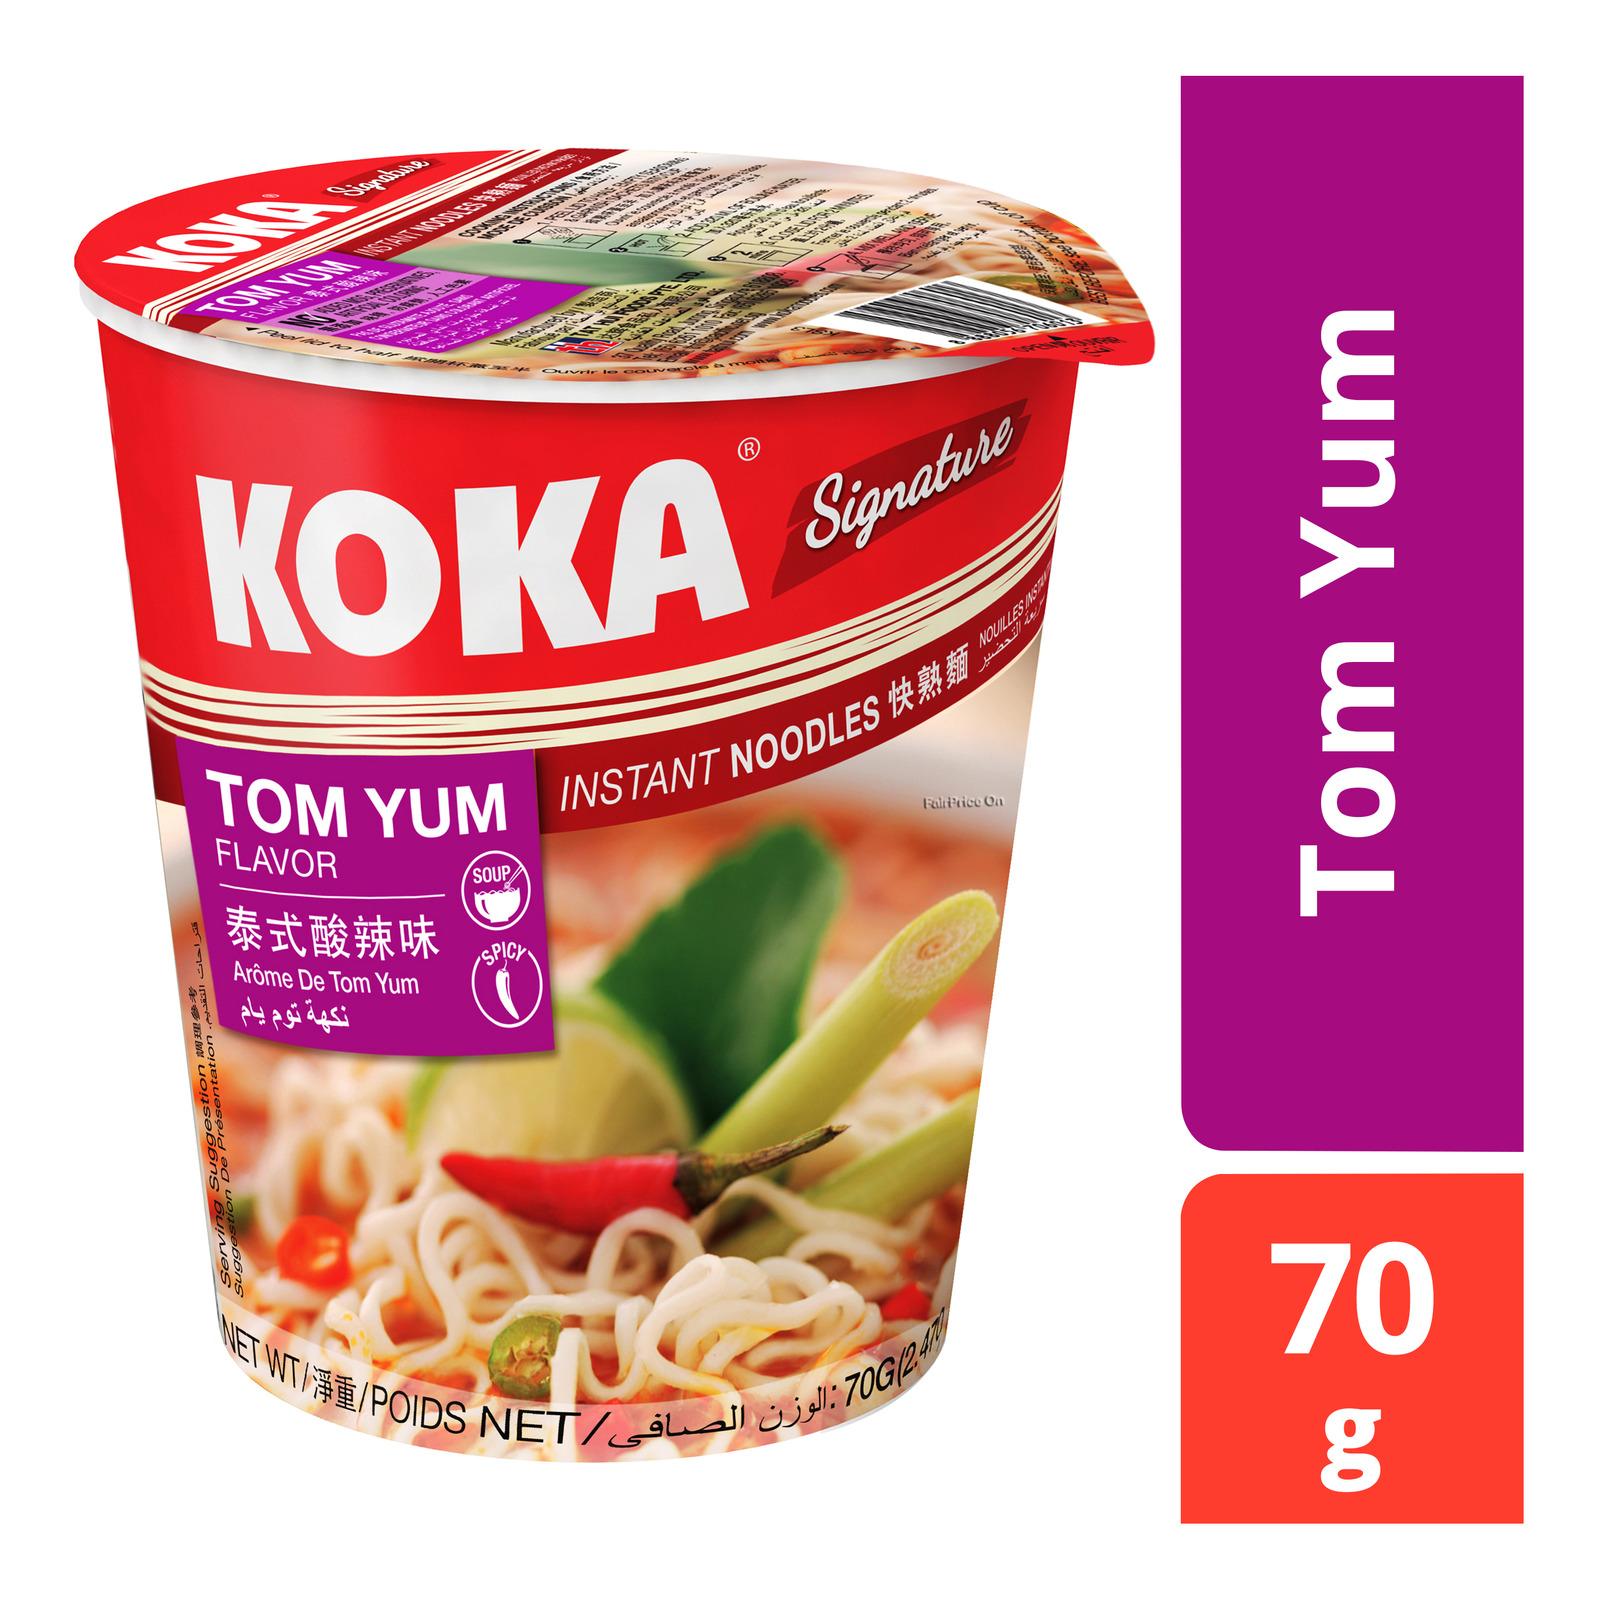 Koka Instant Cup Noodles - Tom Yum